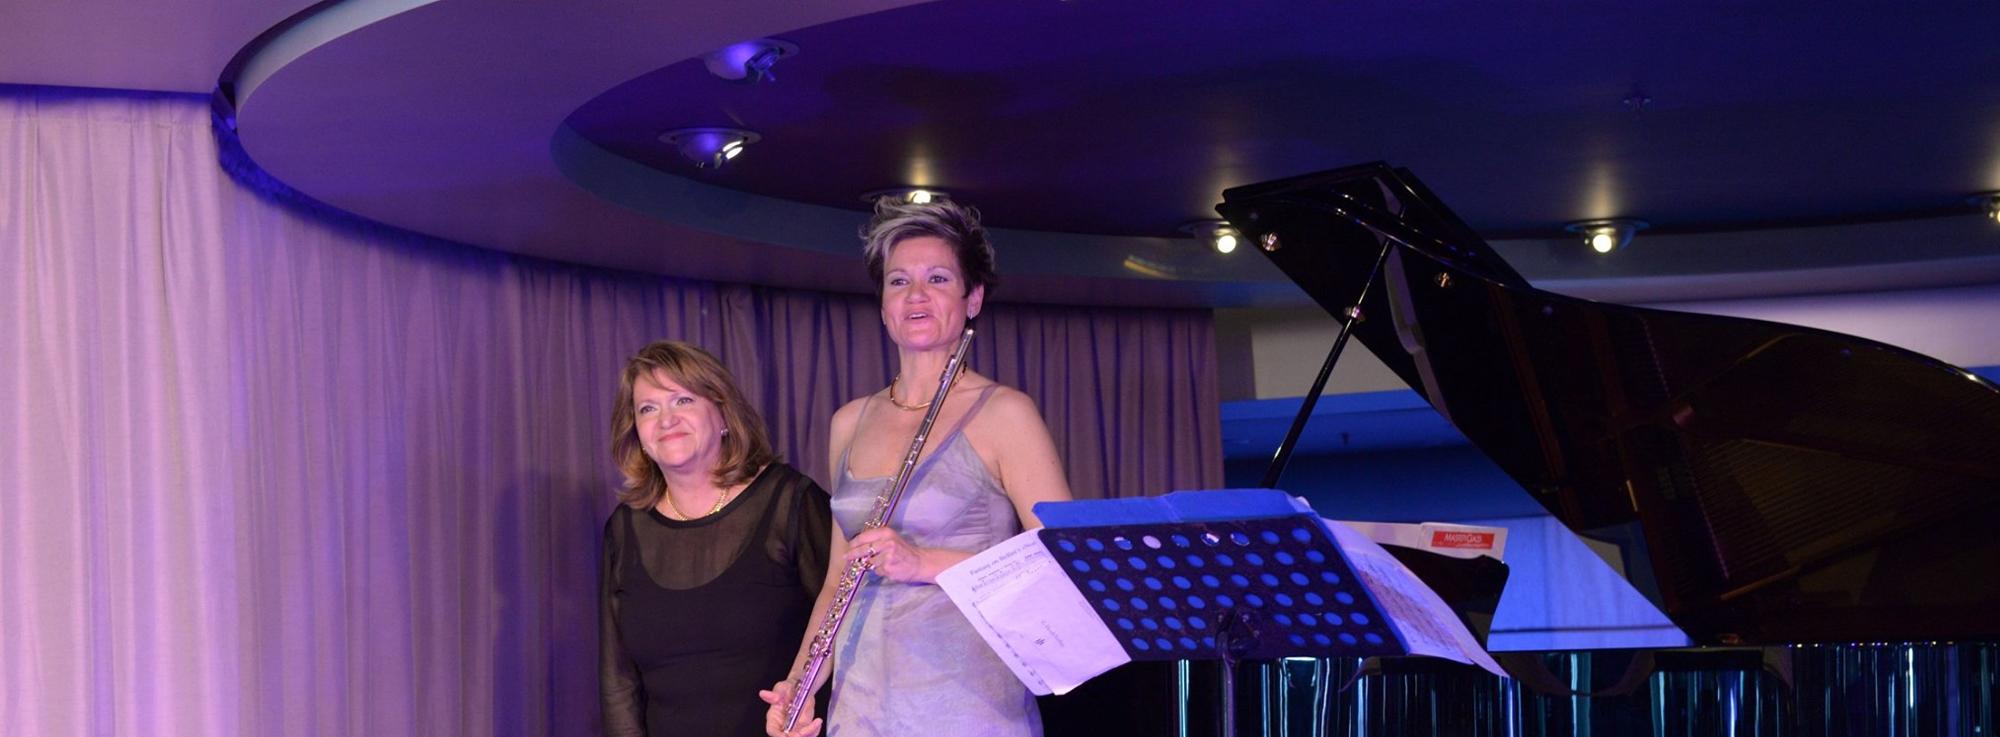 Brindisi: Duo di Francesca Salvemini e Silvana Libardo